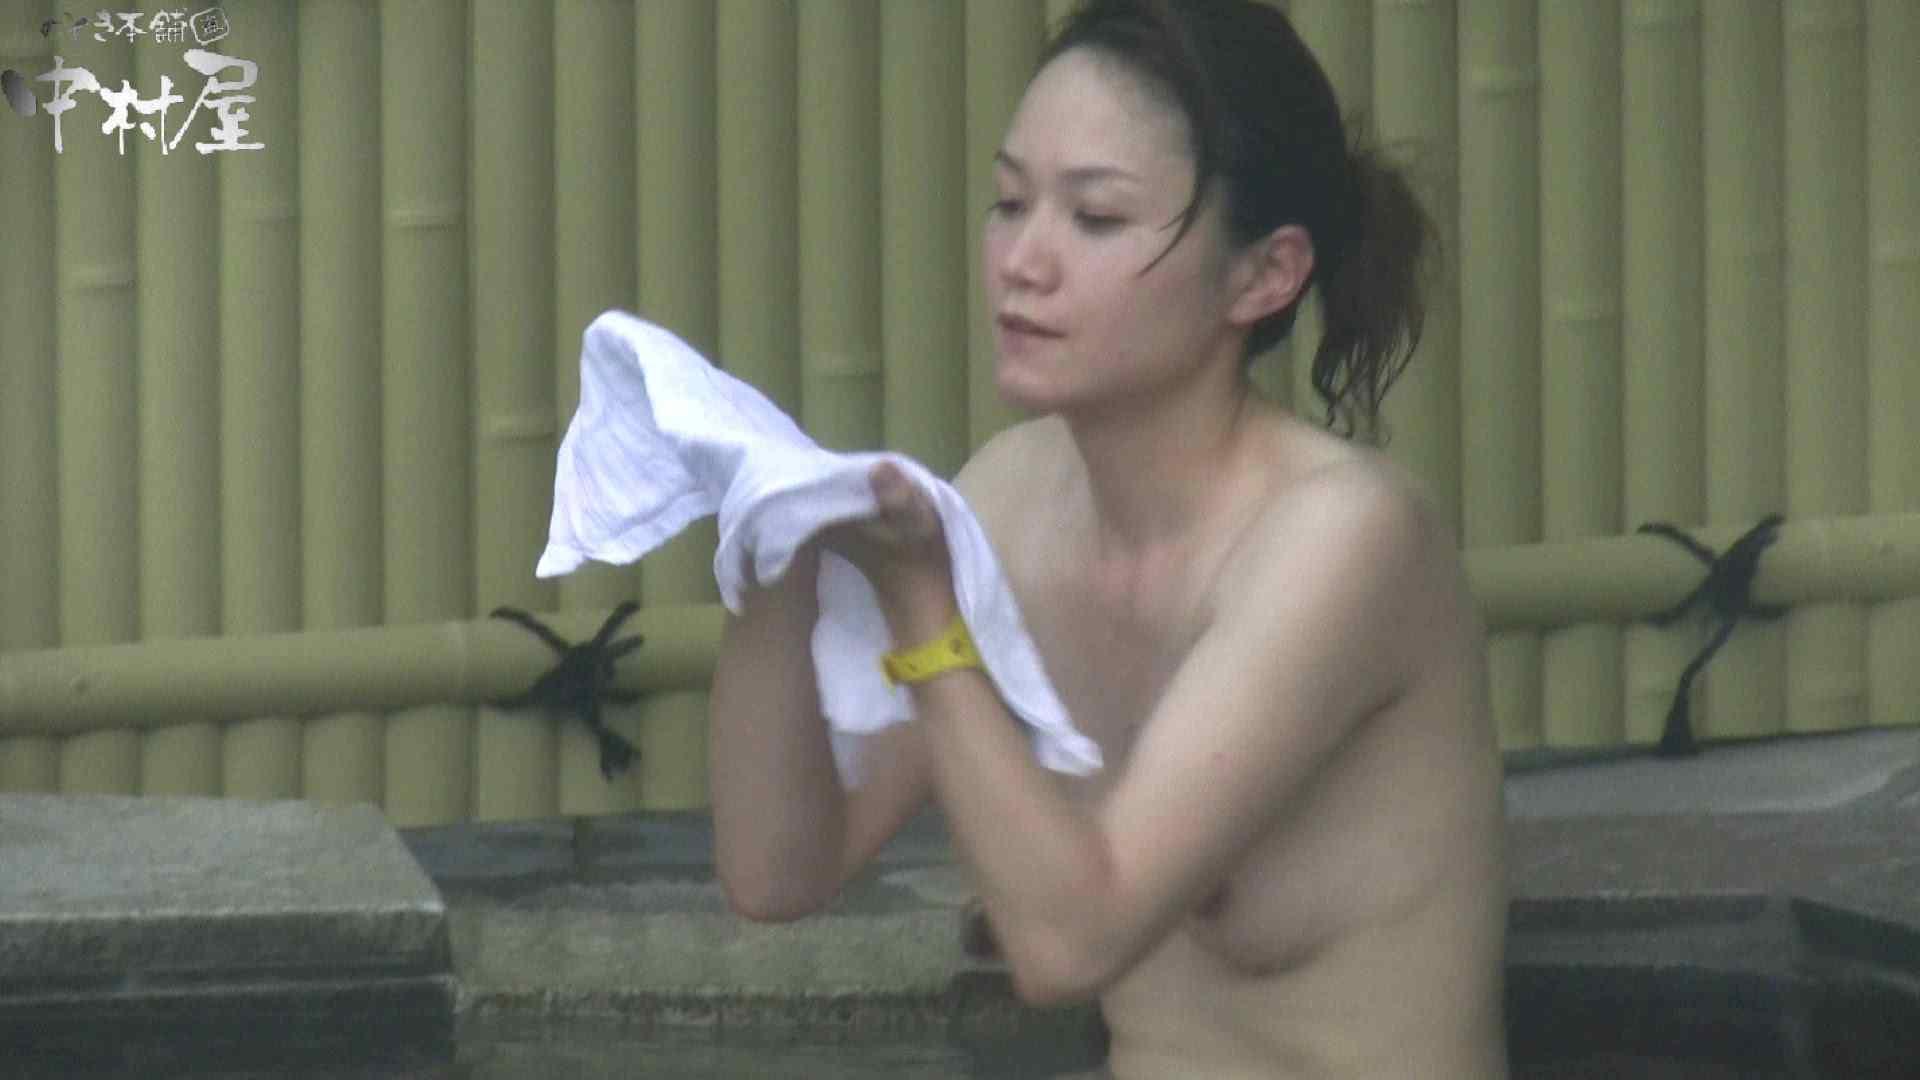 Aquaな露天風呂Vol.901 露天風呂編  110PIX 24